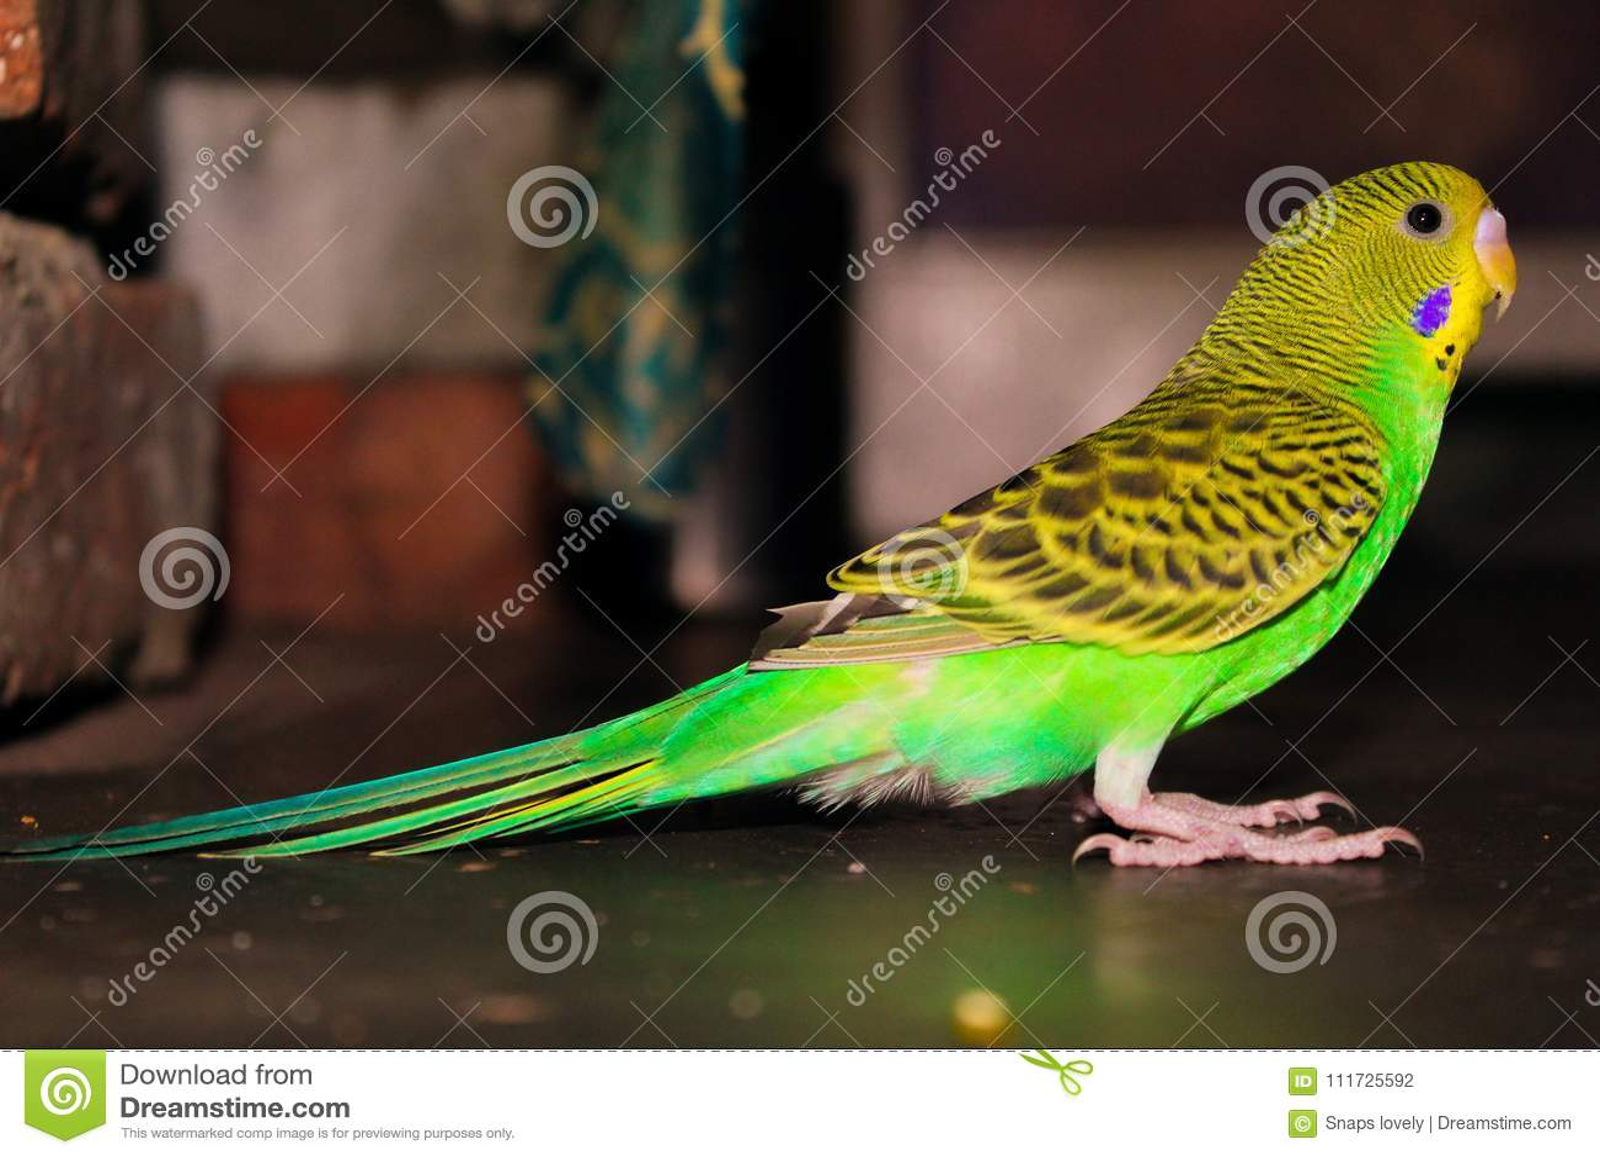 Lovebird koloru żółtego i zieleni piękny lovebird